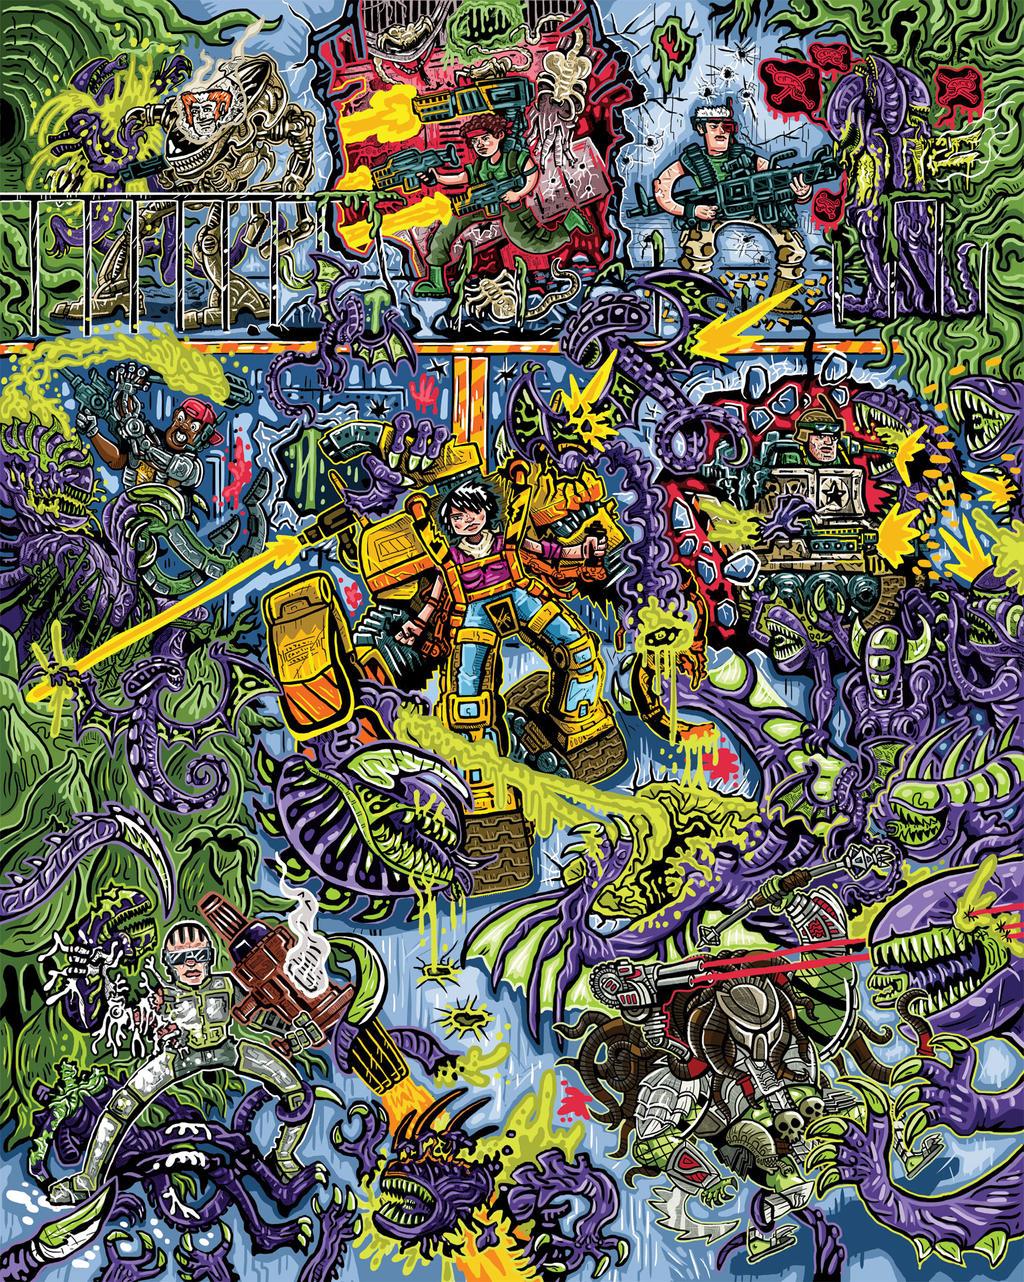 Kenner's 90's Alien Toy Line Poster by ehudsbloodysword